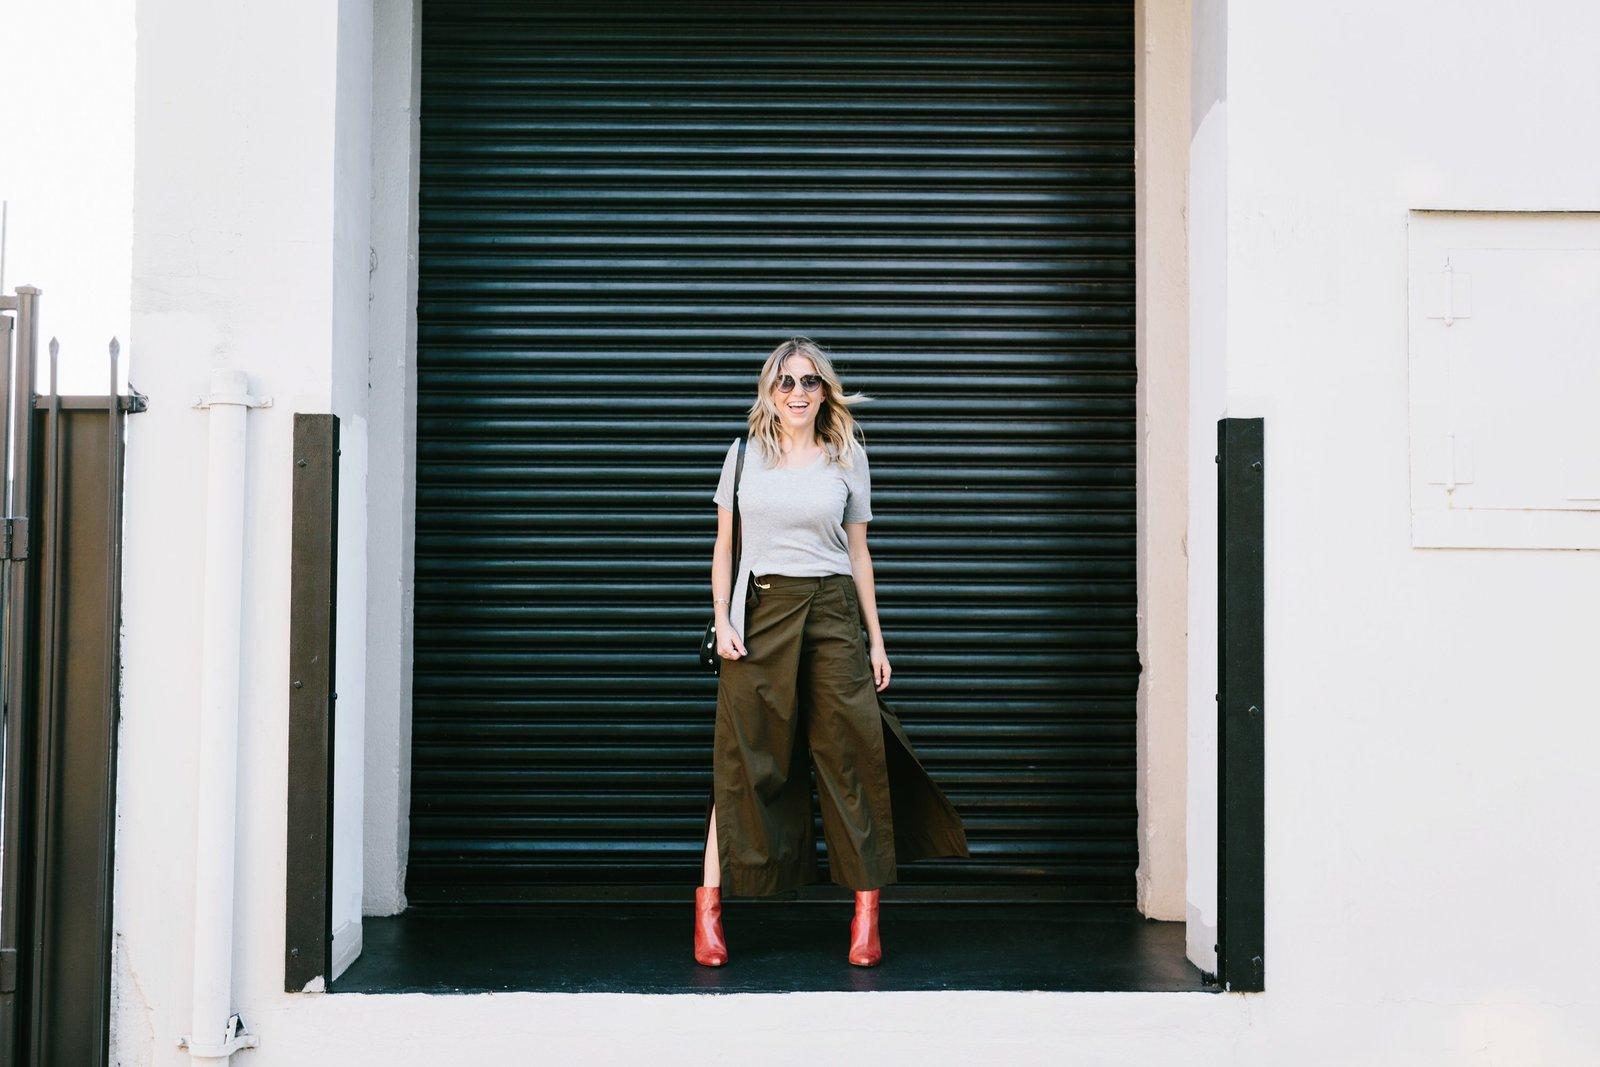 Fashion-Jodee Debes Photography-132